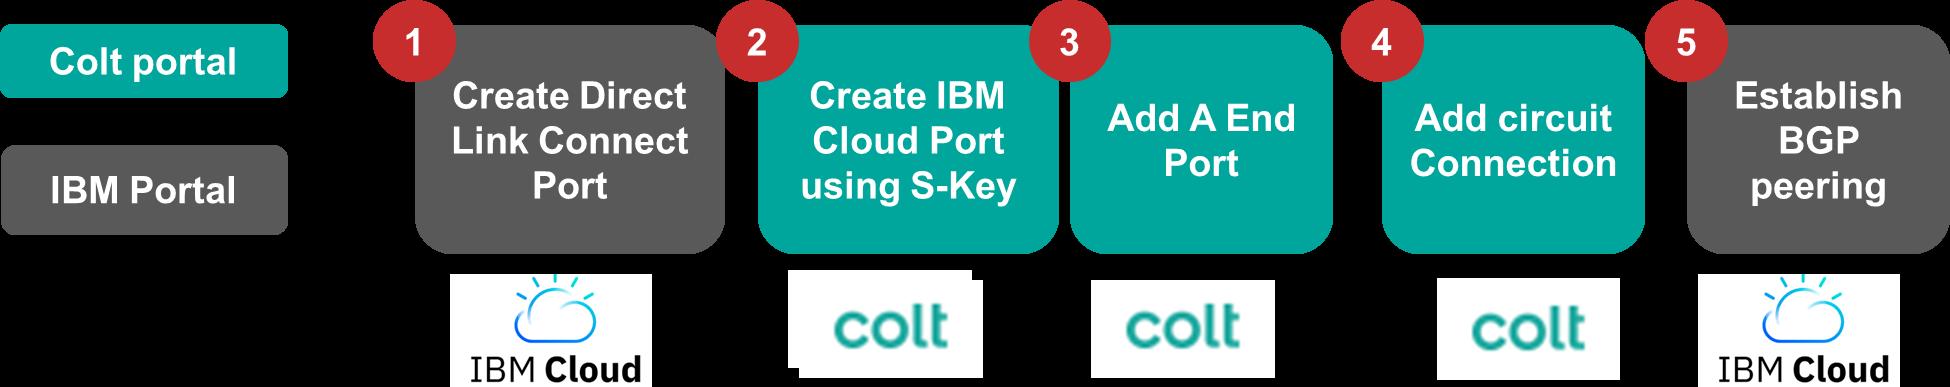 IBM Direct Link Connect Customer Journey